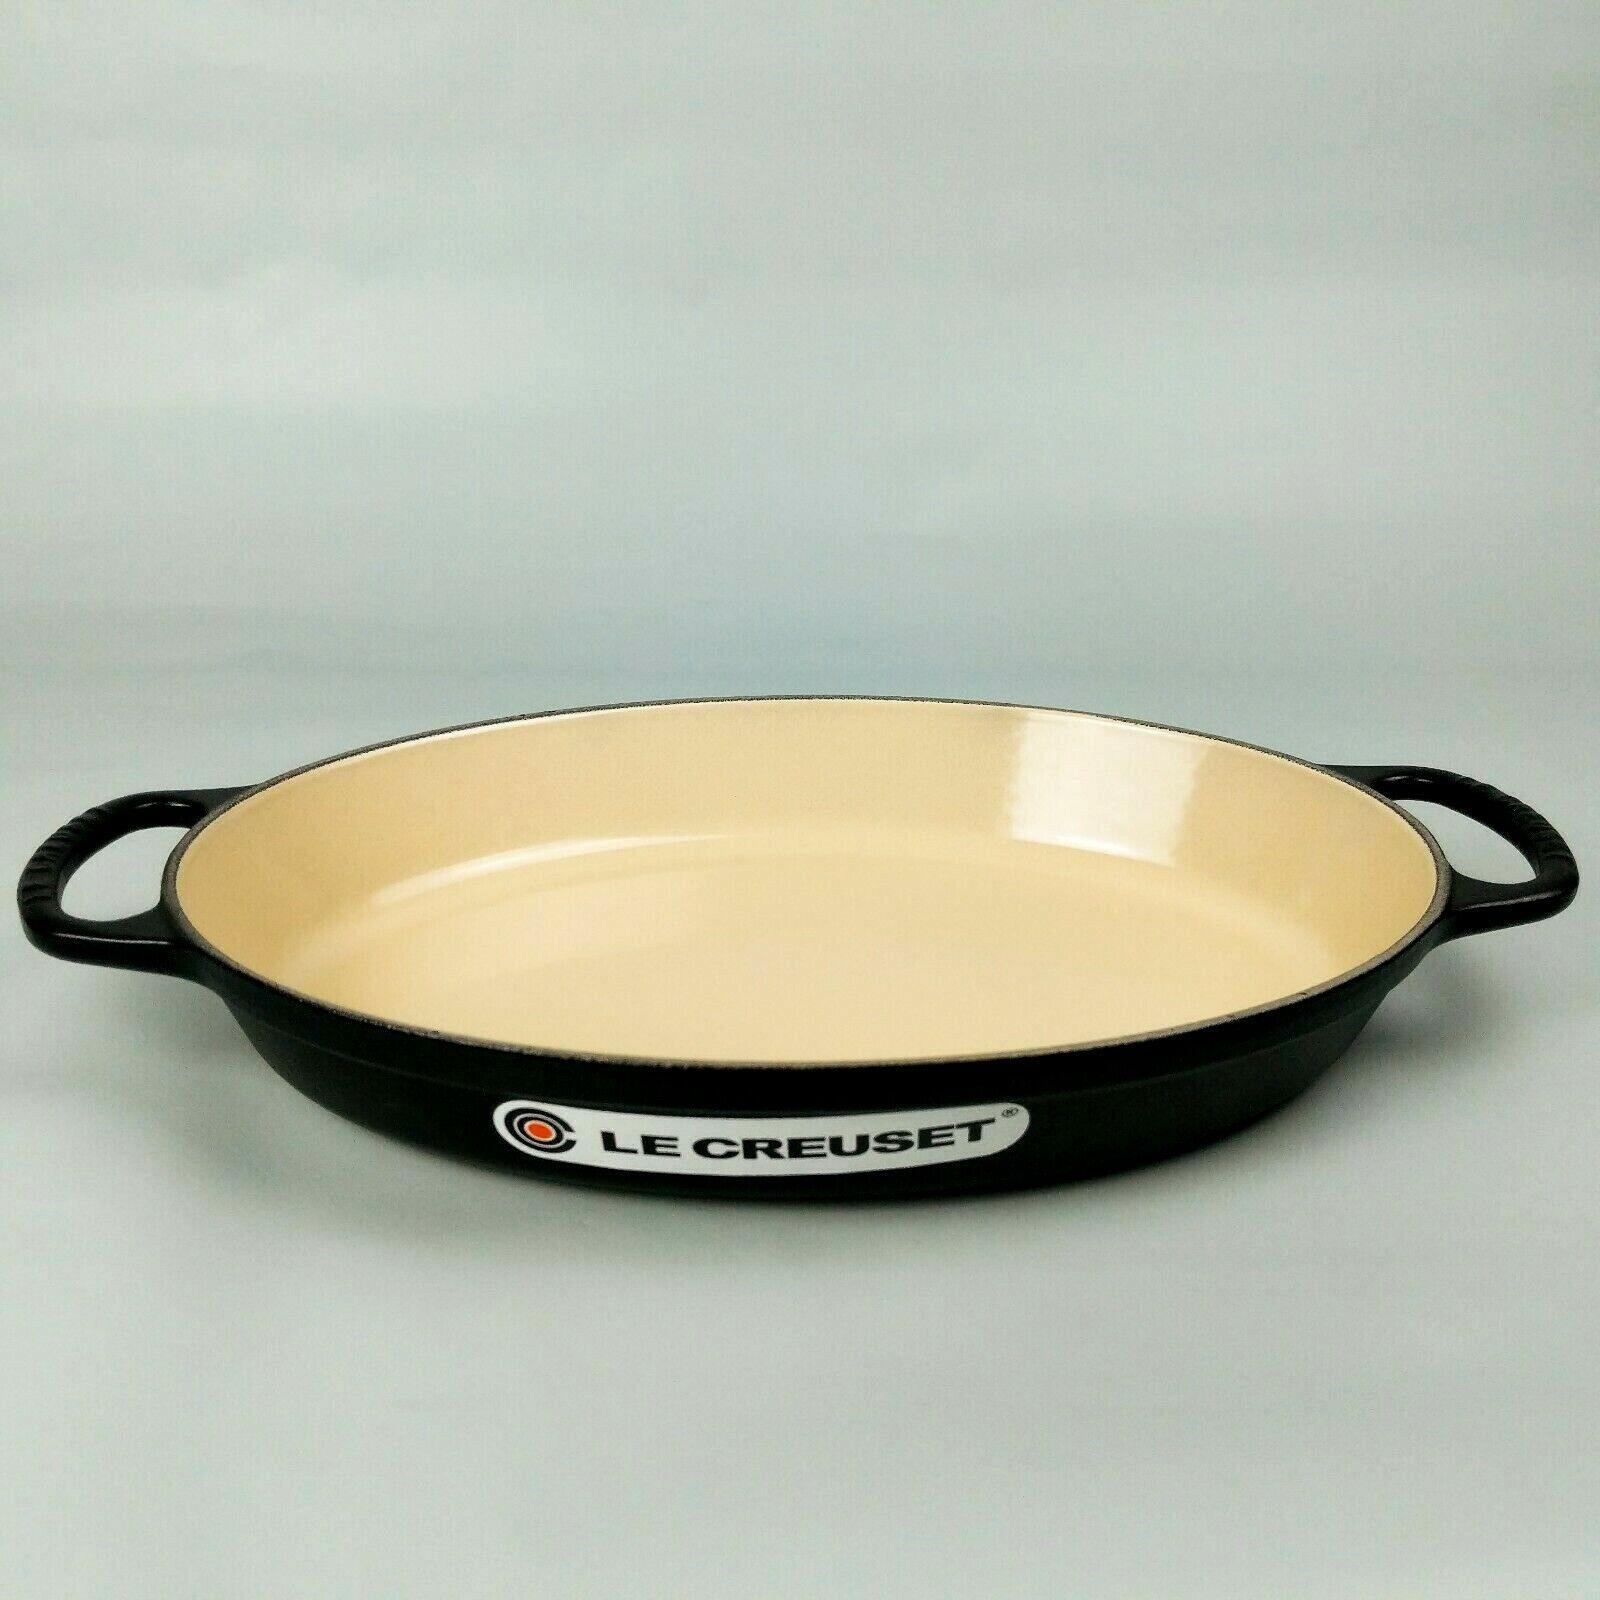 Le Creuset Signature Mate Negro Esmalte plana de hierro fundido Oval Baker 2.25qt 2L 32cm